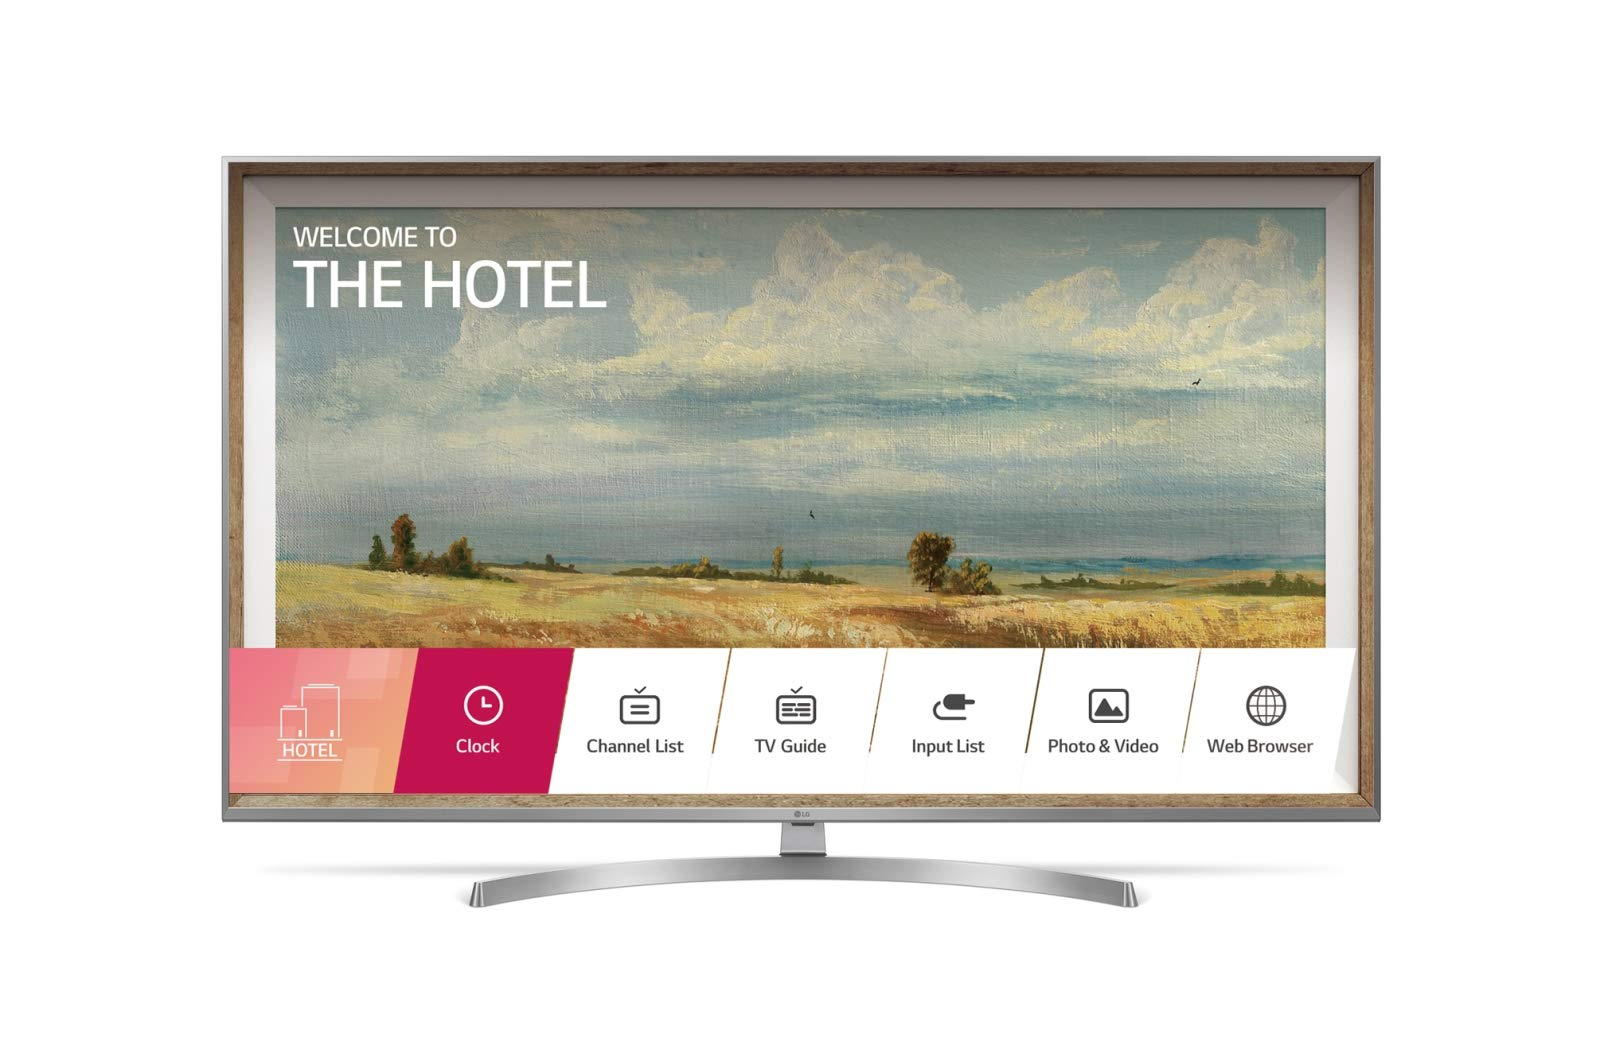 LG 49UU761H Hospitality TV 124,5 cm (49